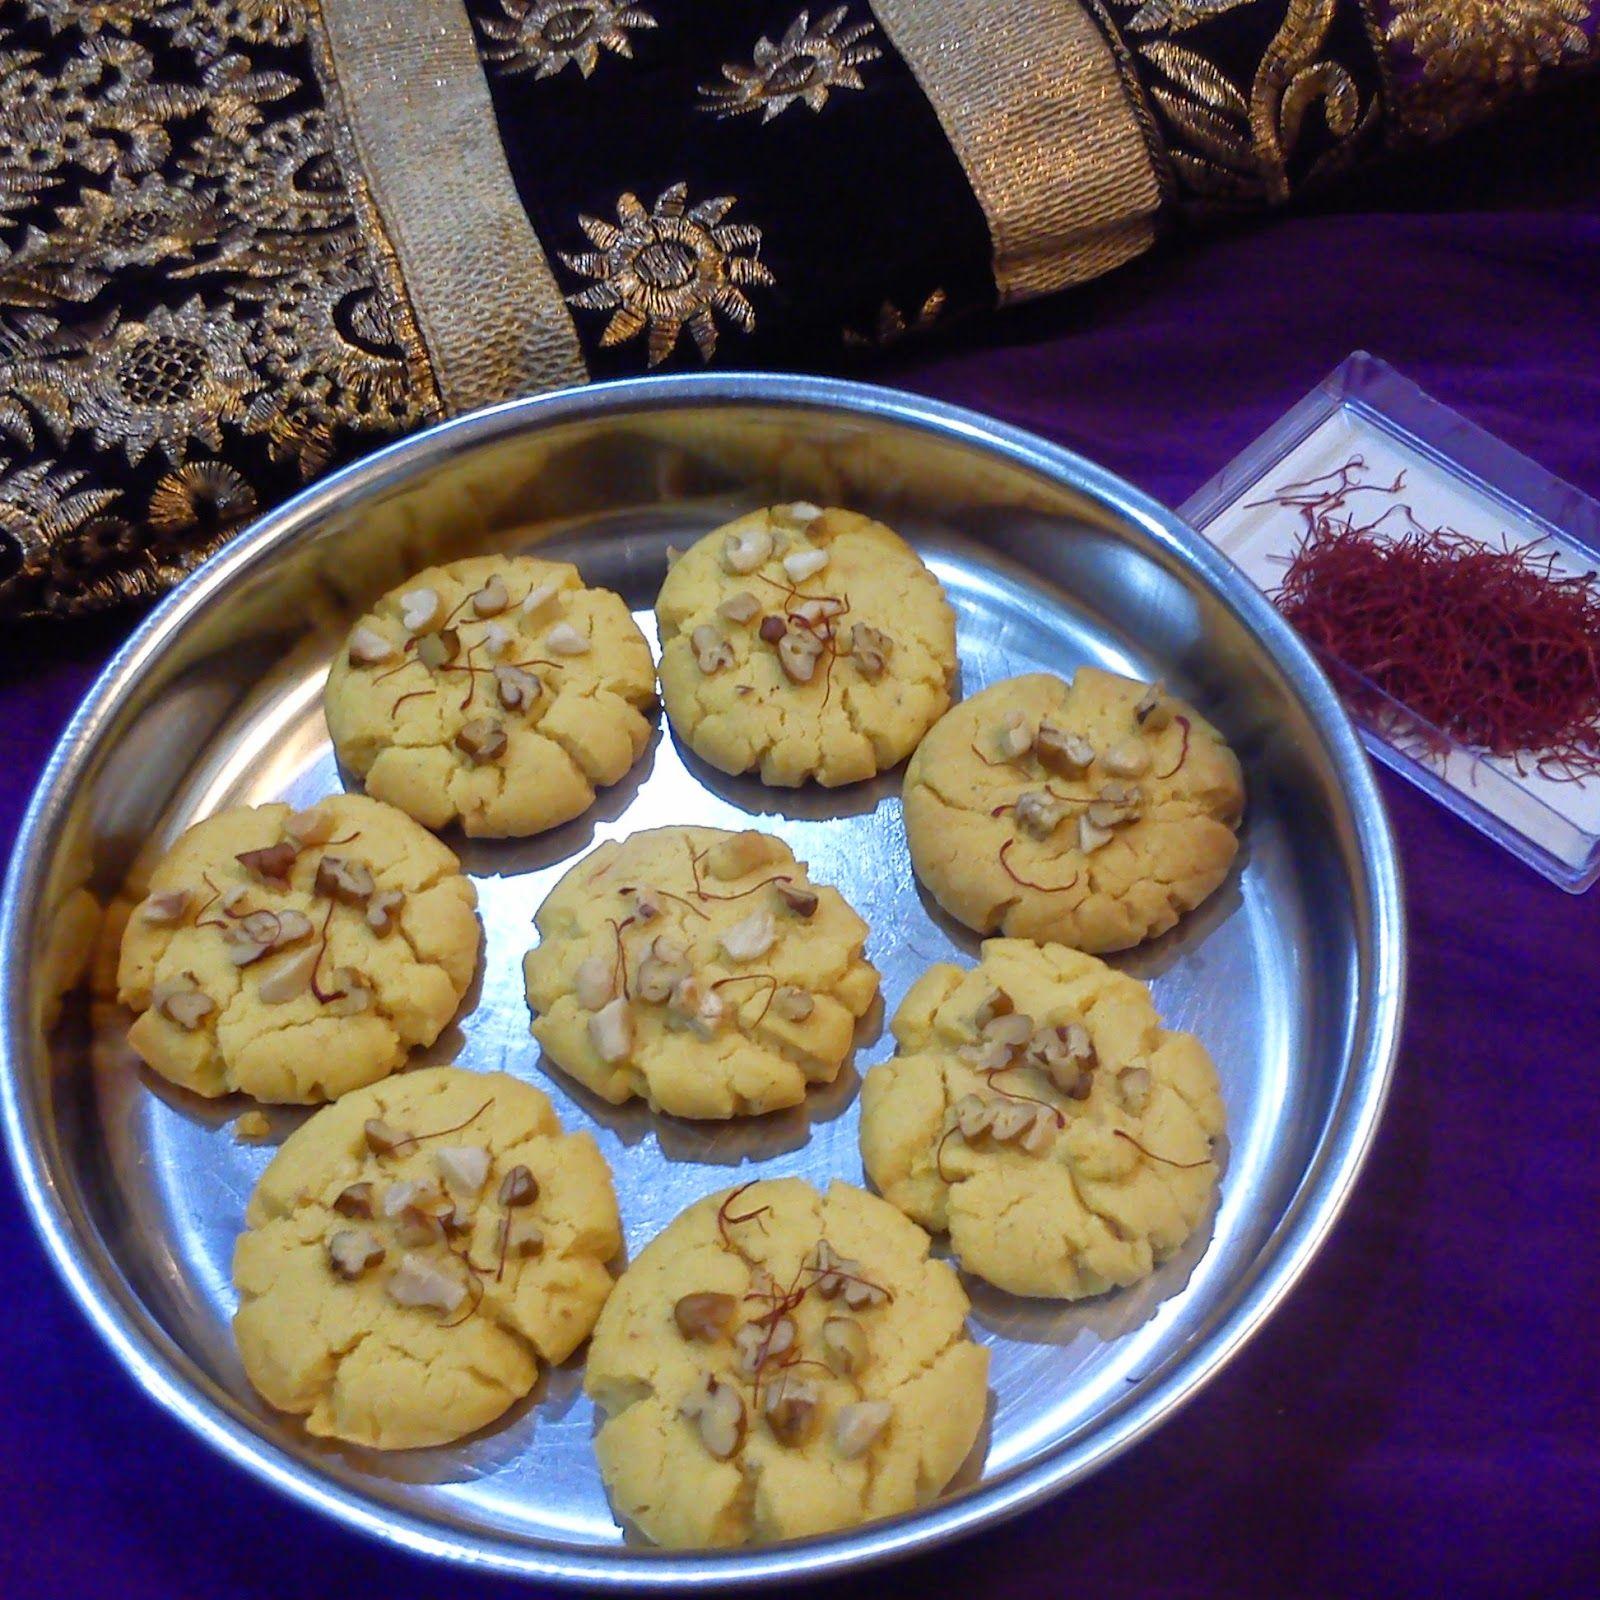 Saffron cardamom cookies